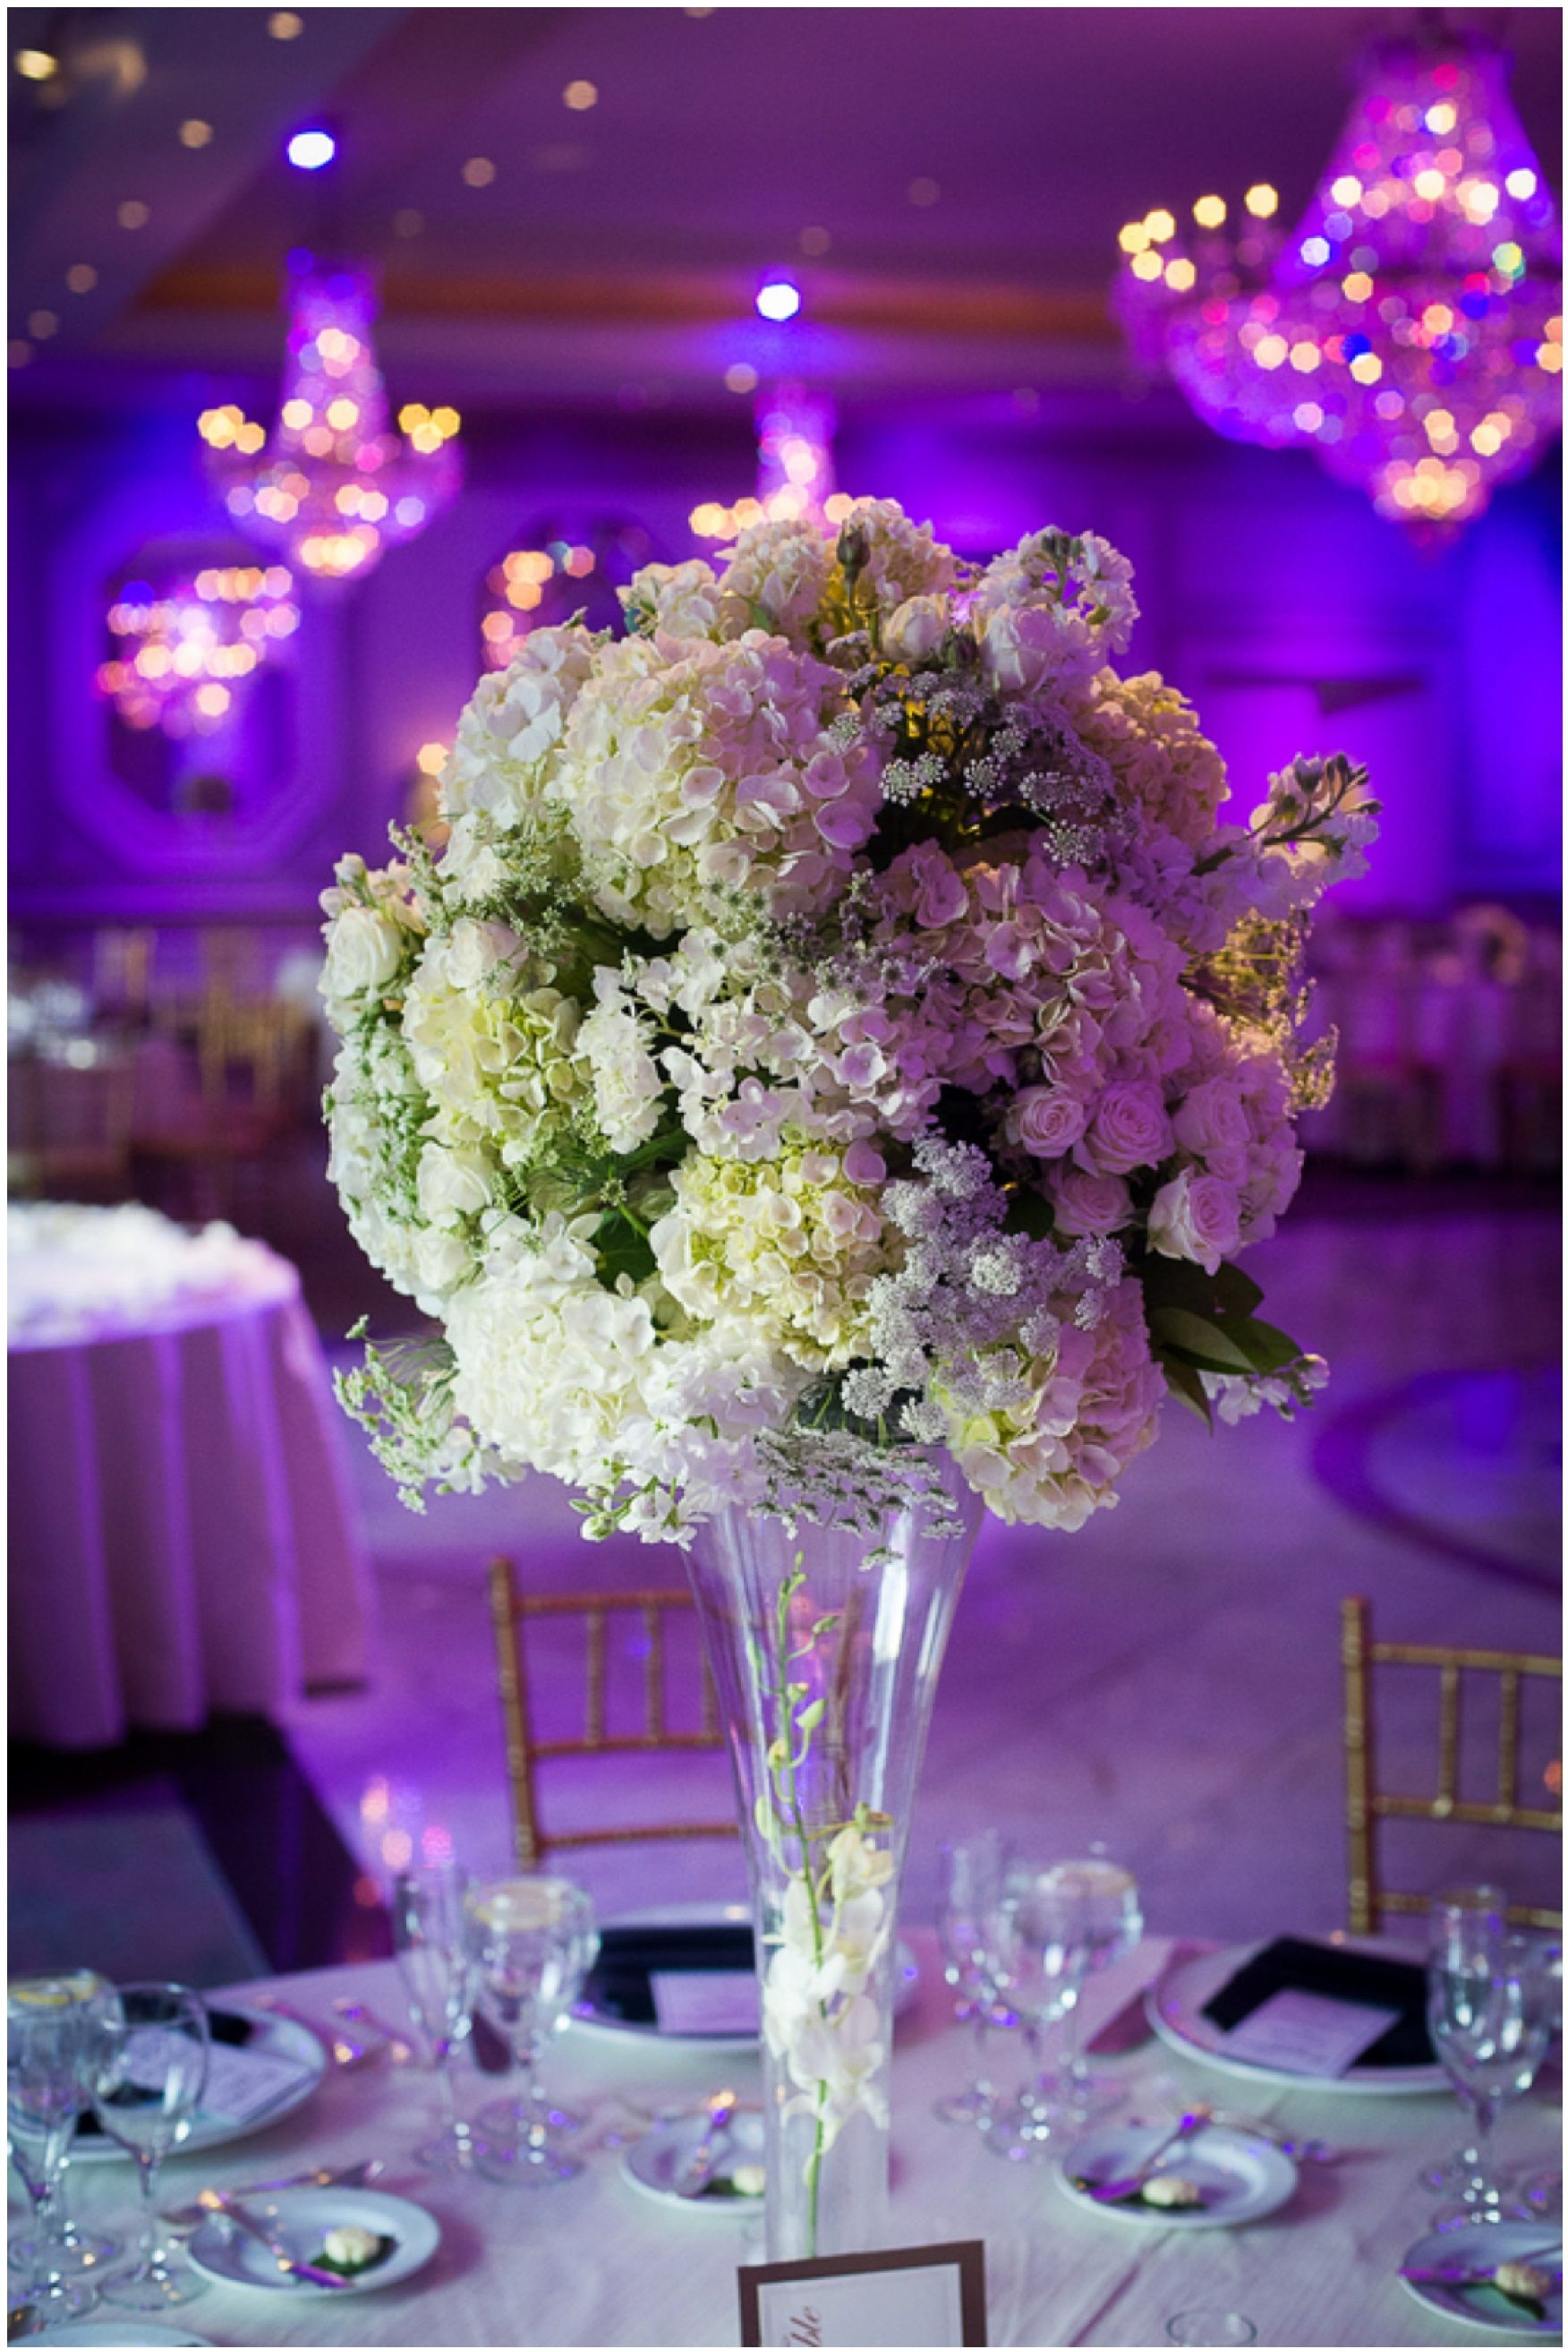 Diy decorations for wedding  Uplighting  The Ballroom  Pinterest  Diy centerpieces